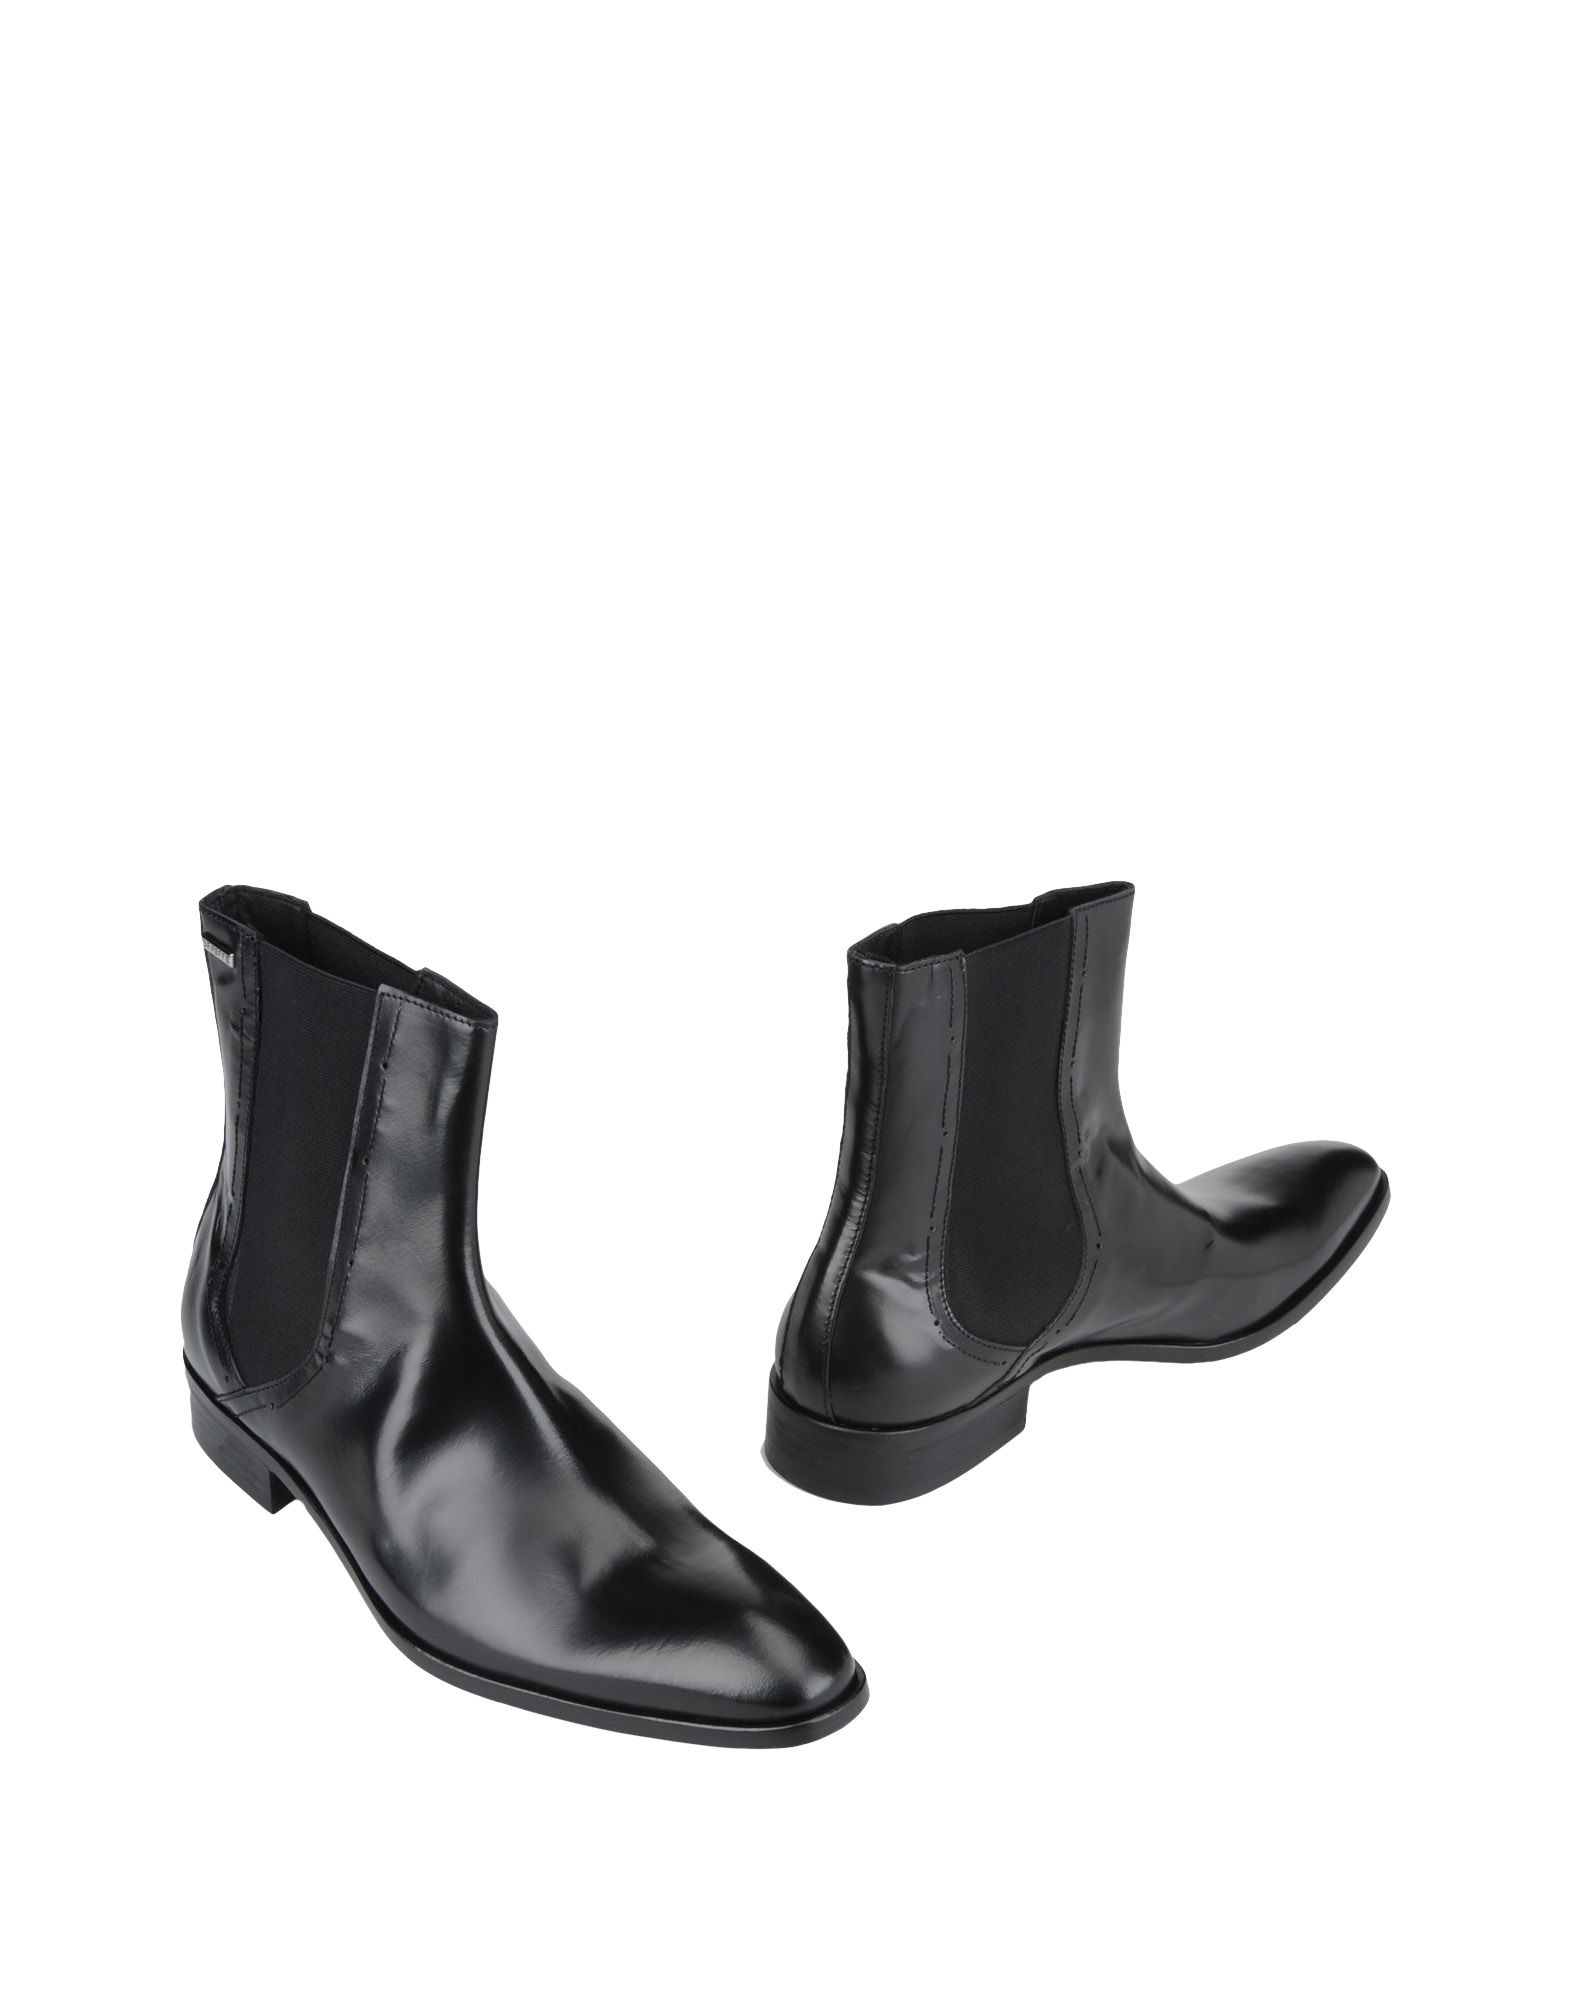 Gianfranco Ferr 233 Ankle Boots In Black For Men Lyst